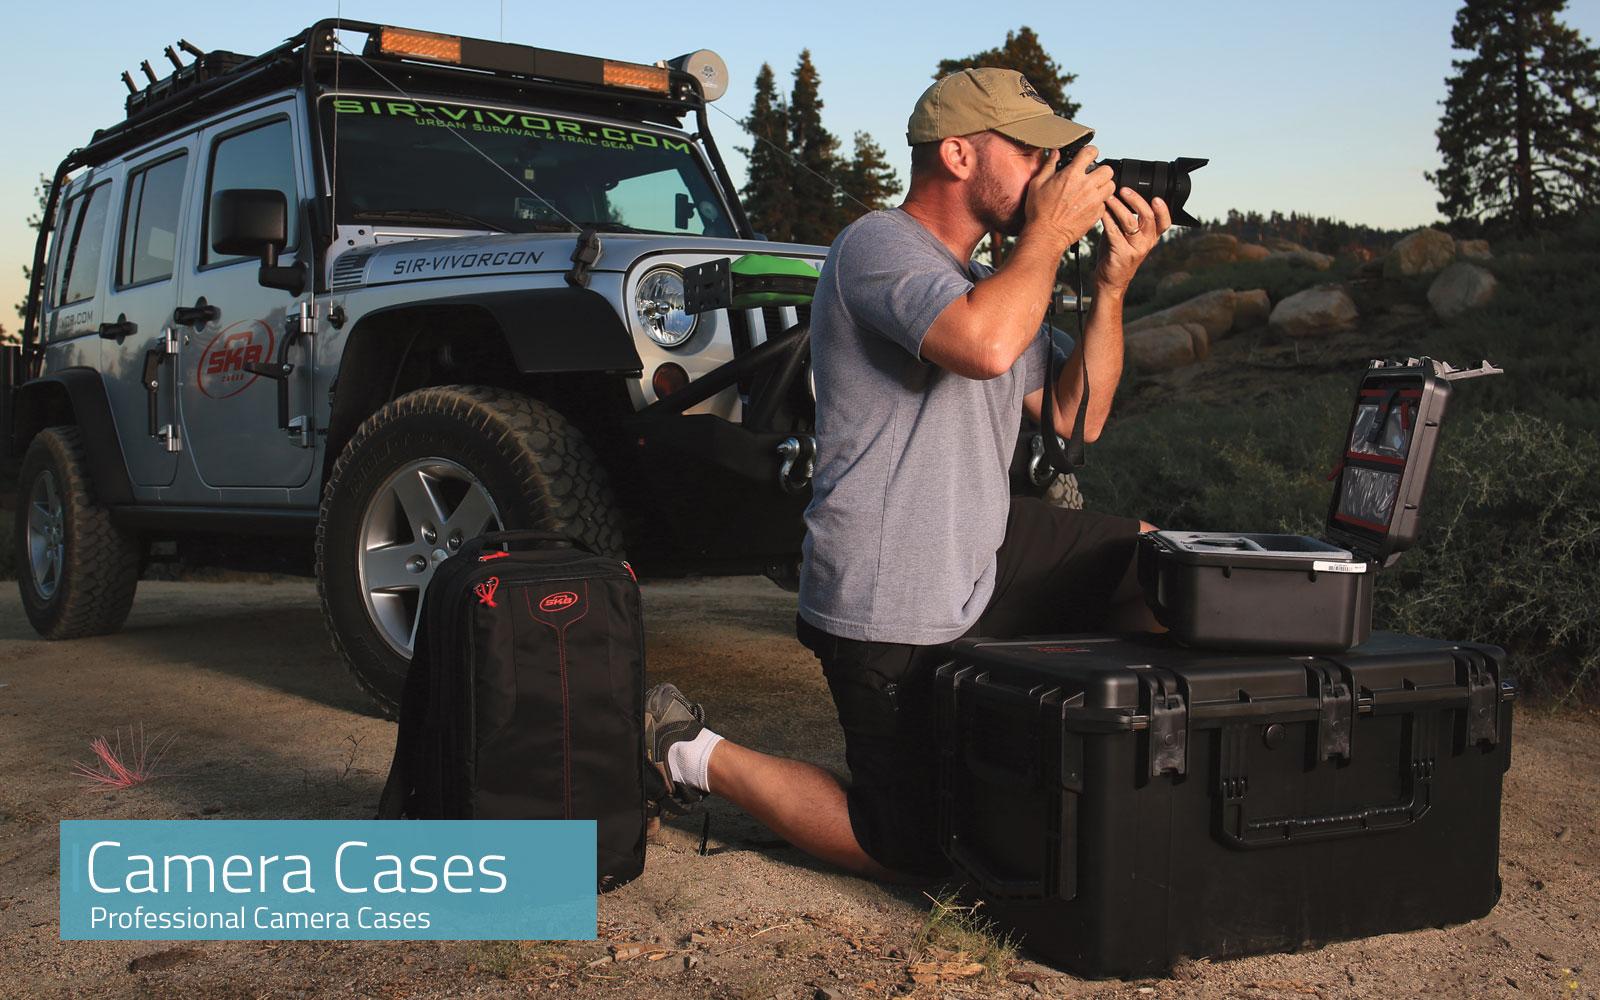 Professional Camera Cases